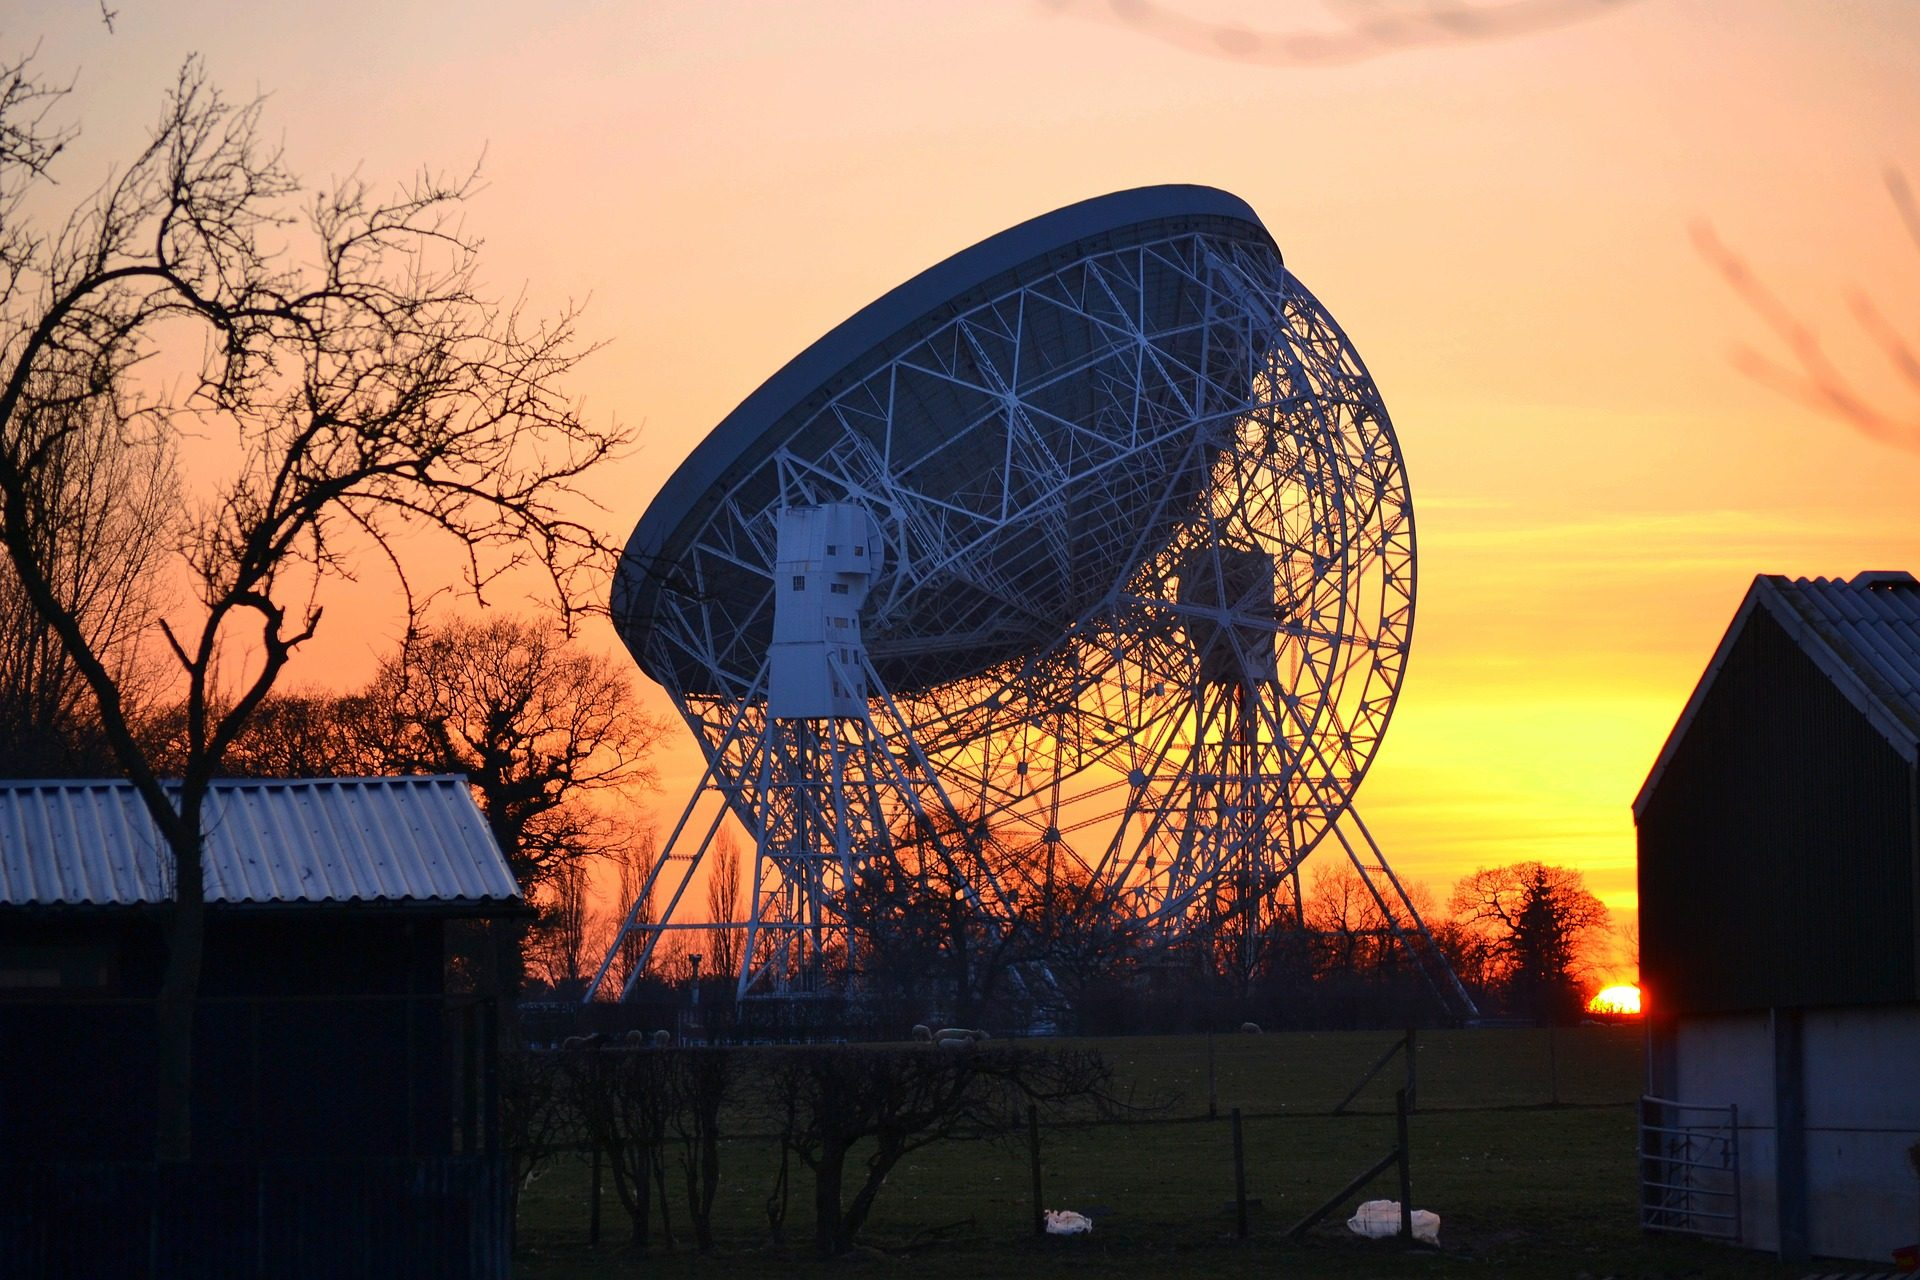 plataforma, estructura, telescopio, antena, ondas, radio - Fondos de Pantalla HD - professor-falken.com